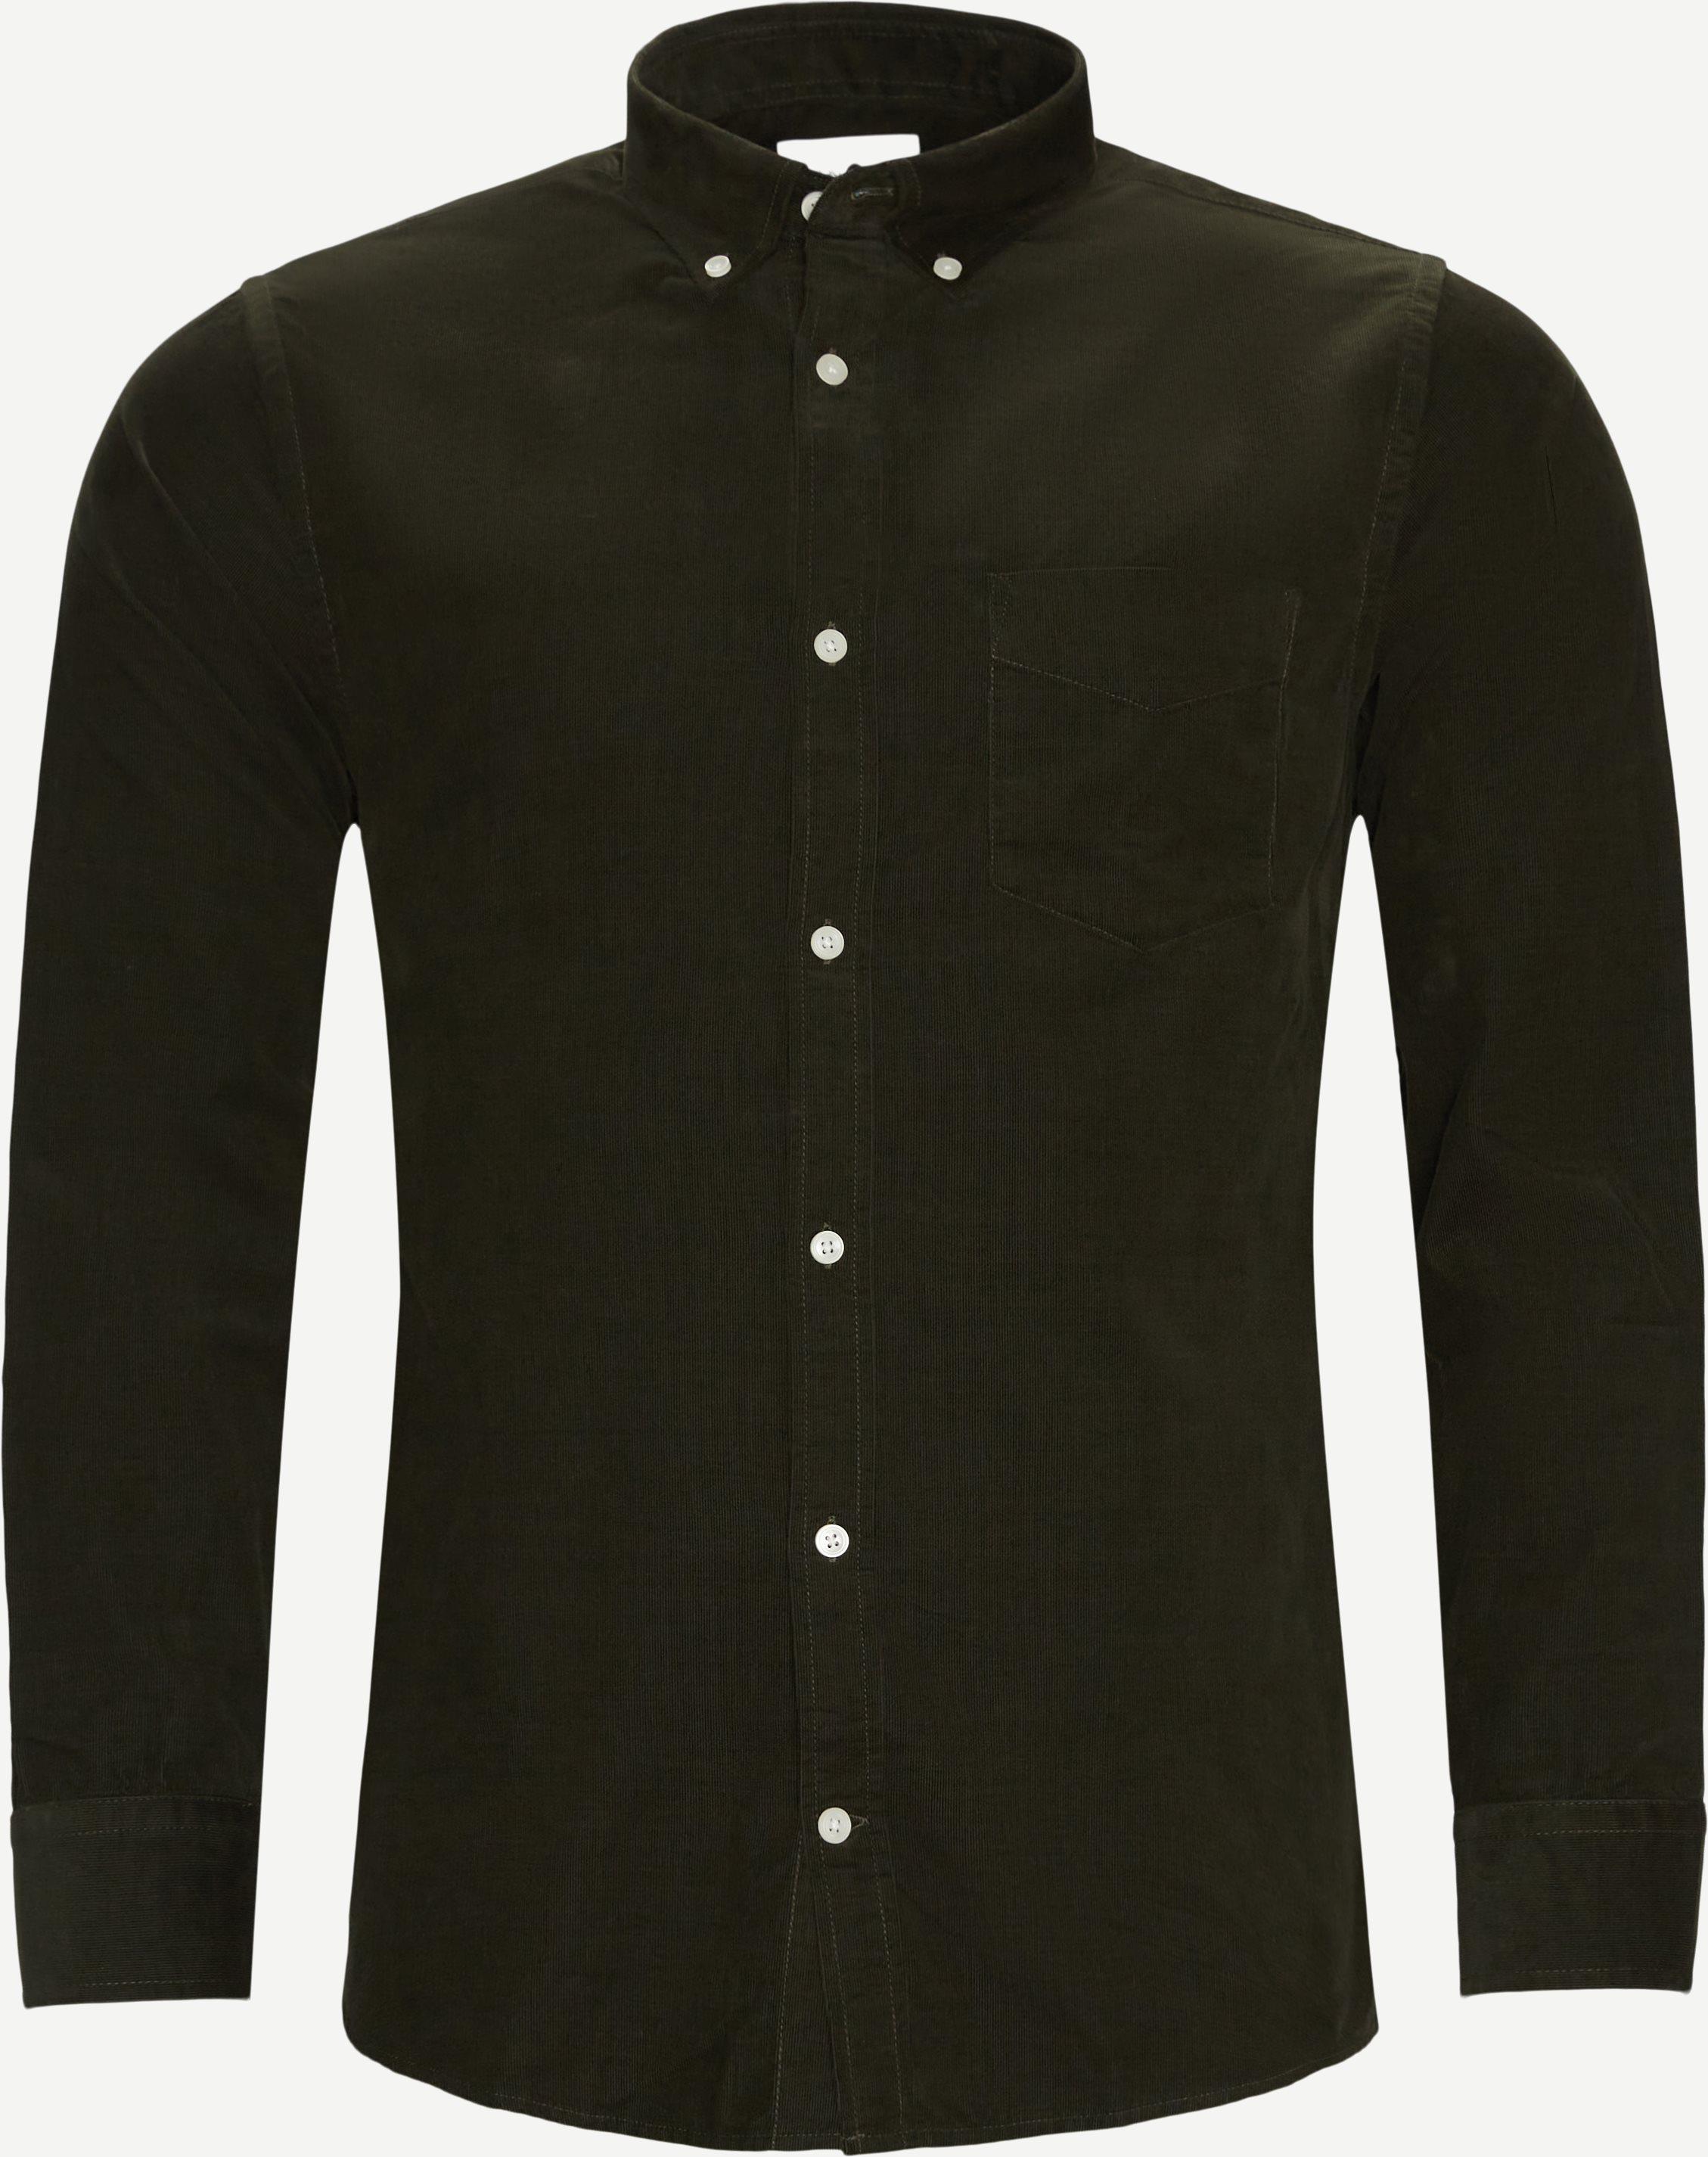 Levon Fløjels Skjorte - Skjorter - Regular fit - Army